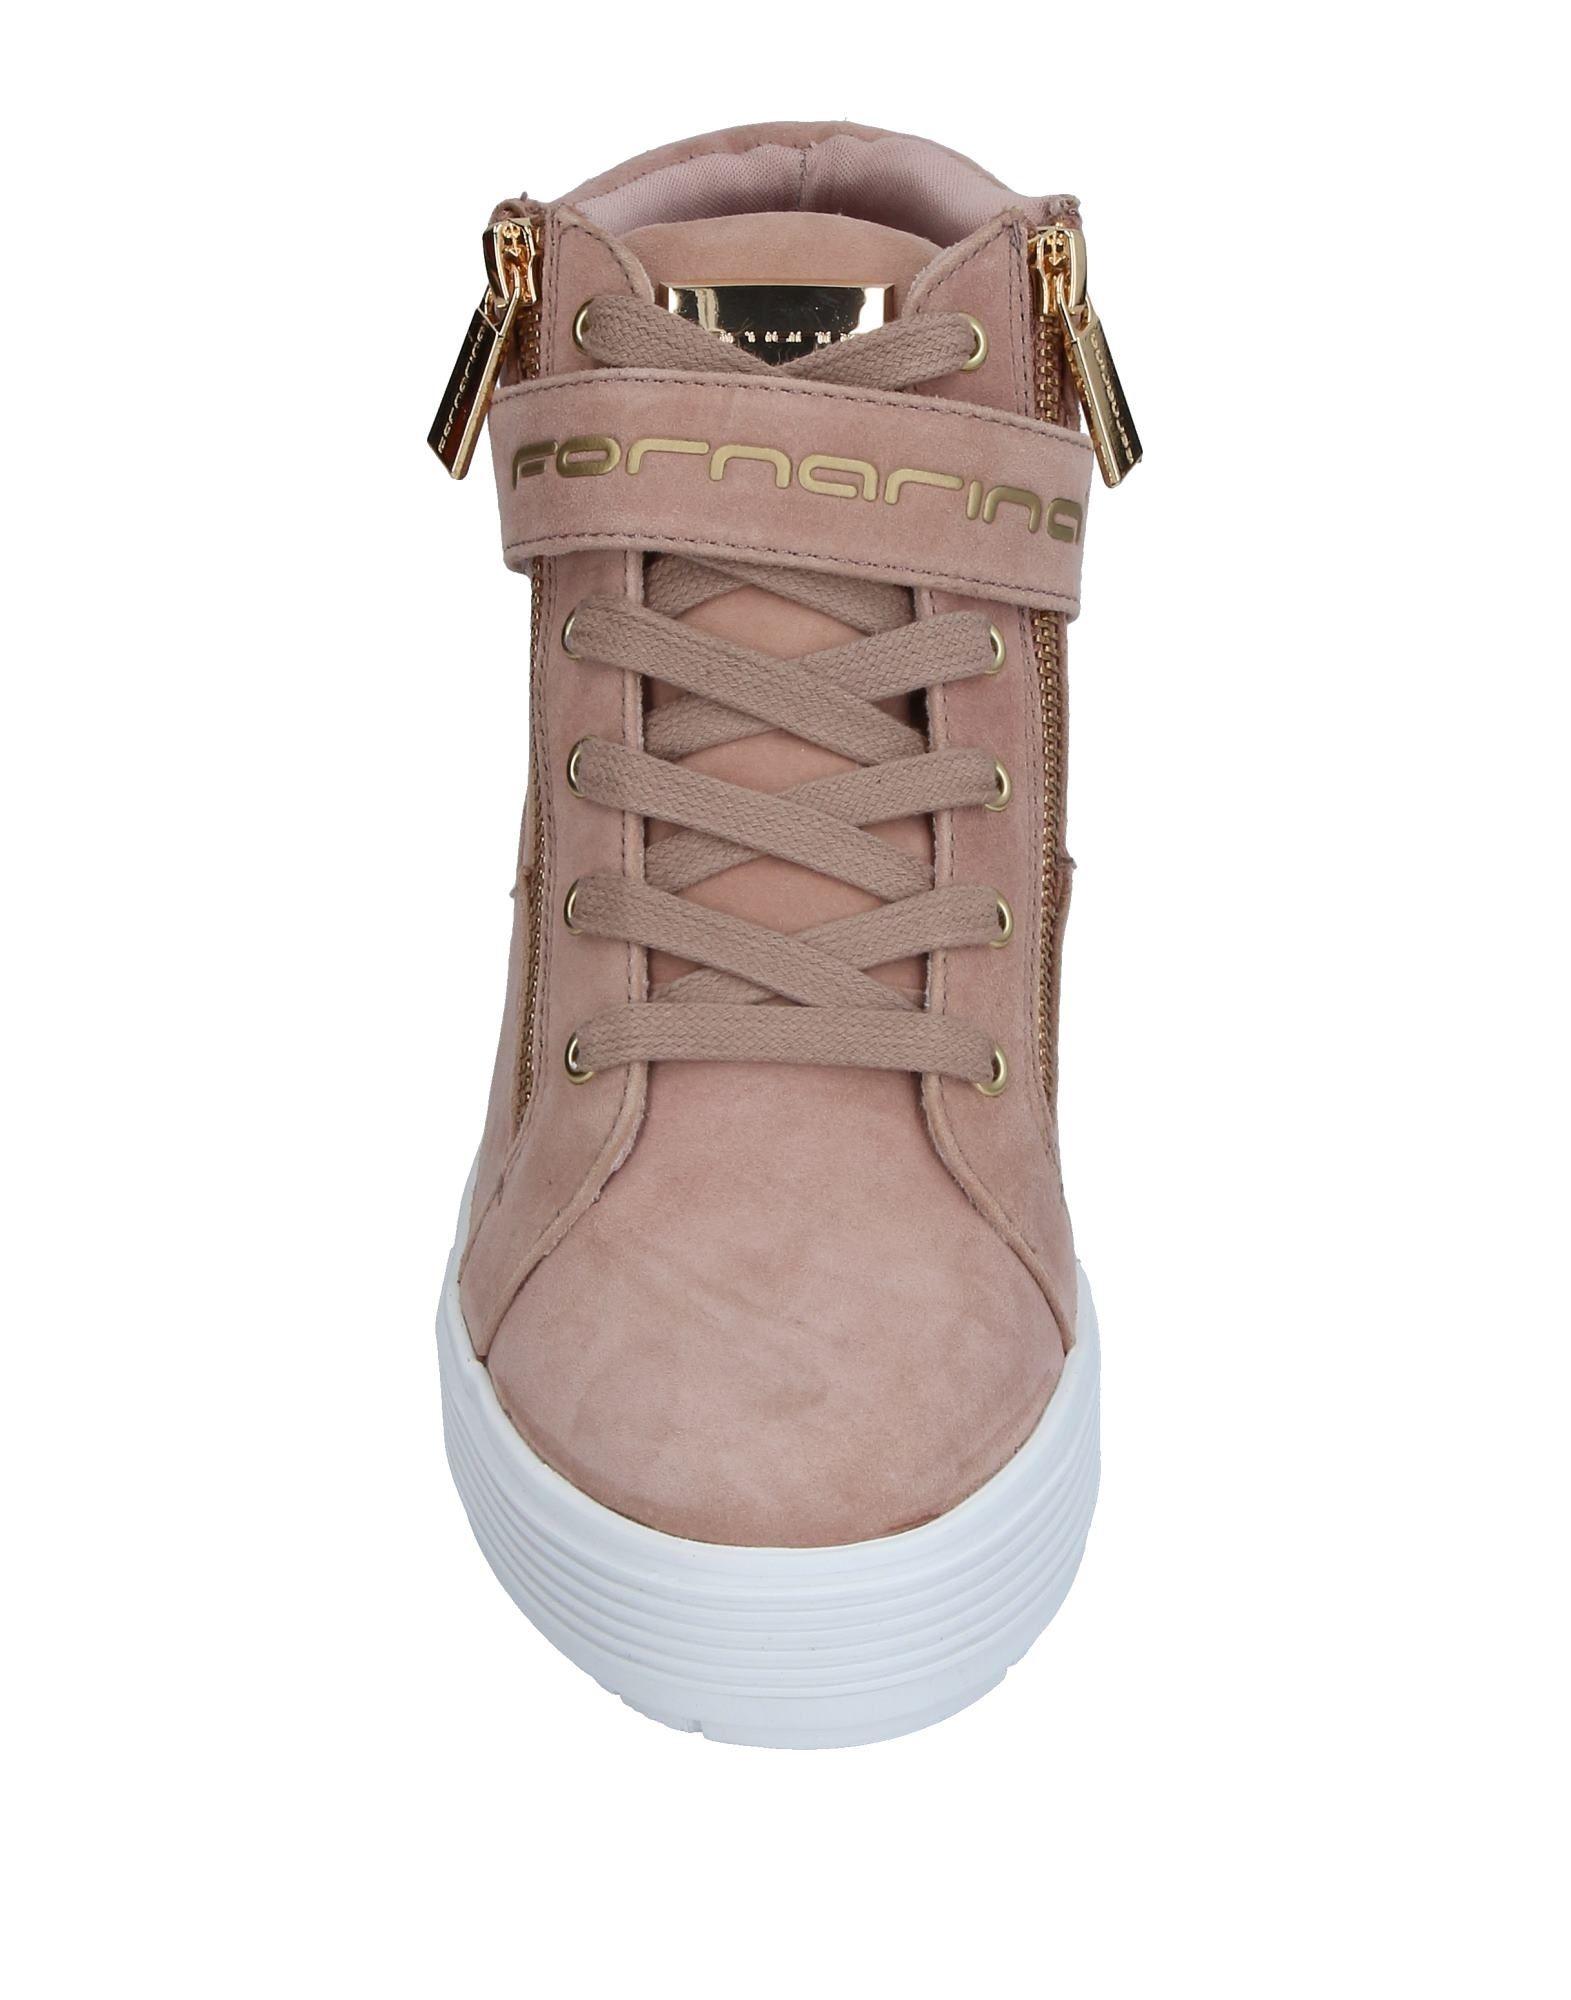 11253675JL Fornarina Sneakers Damen  11253675JL  ee8f3f